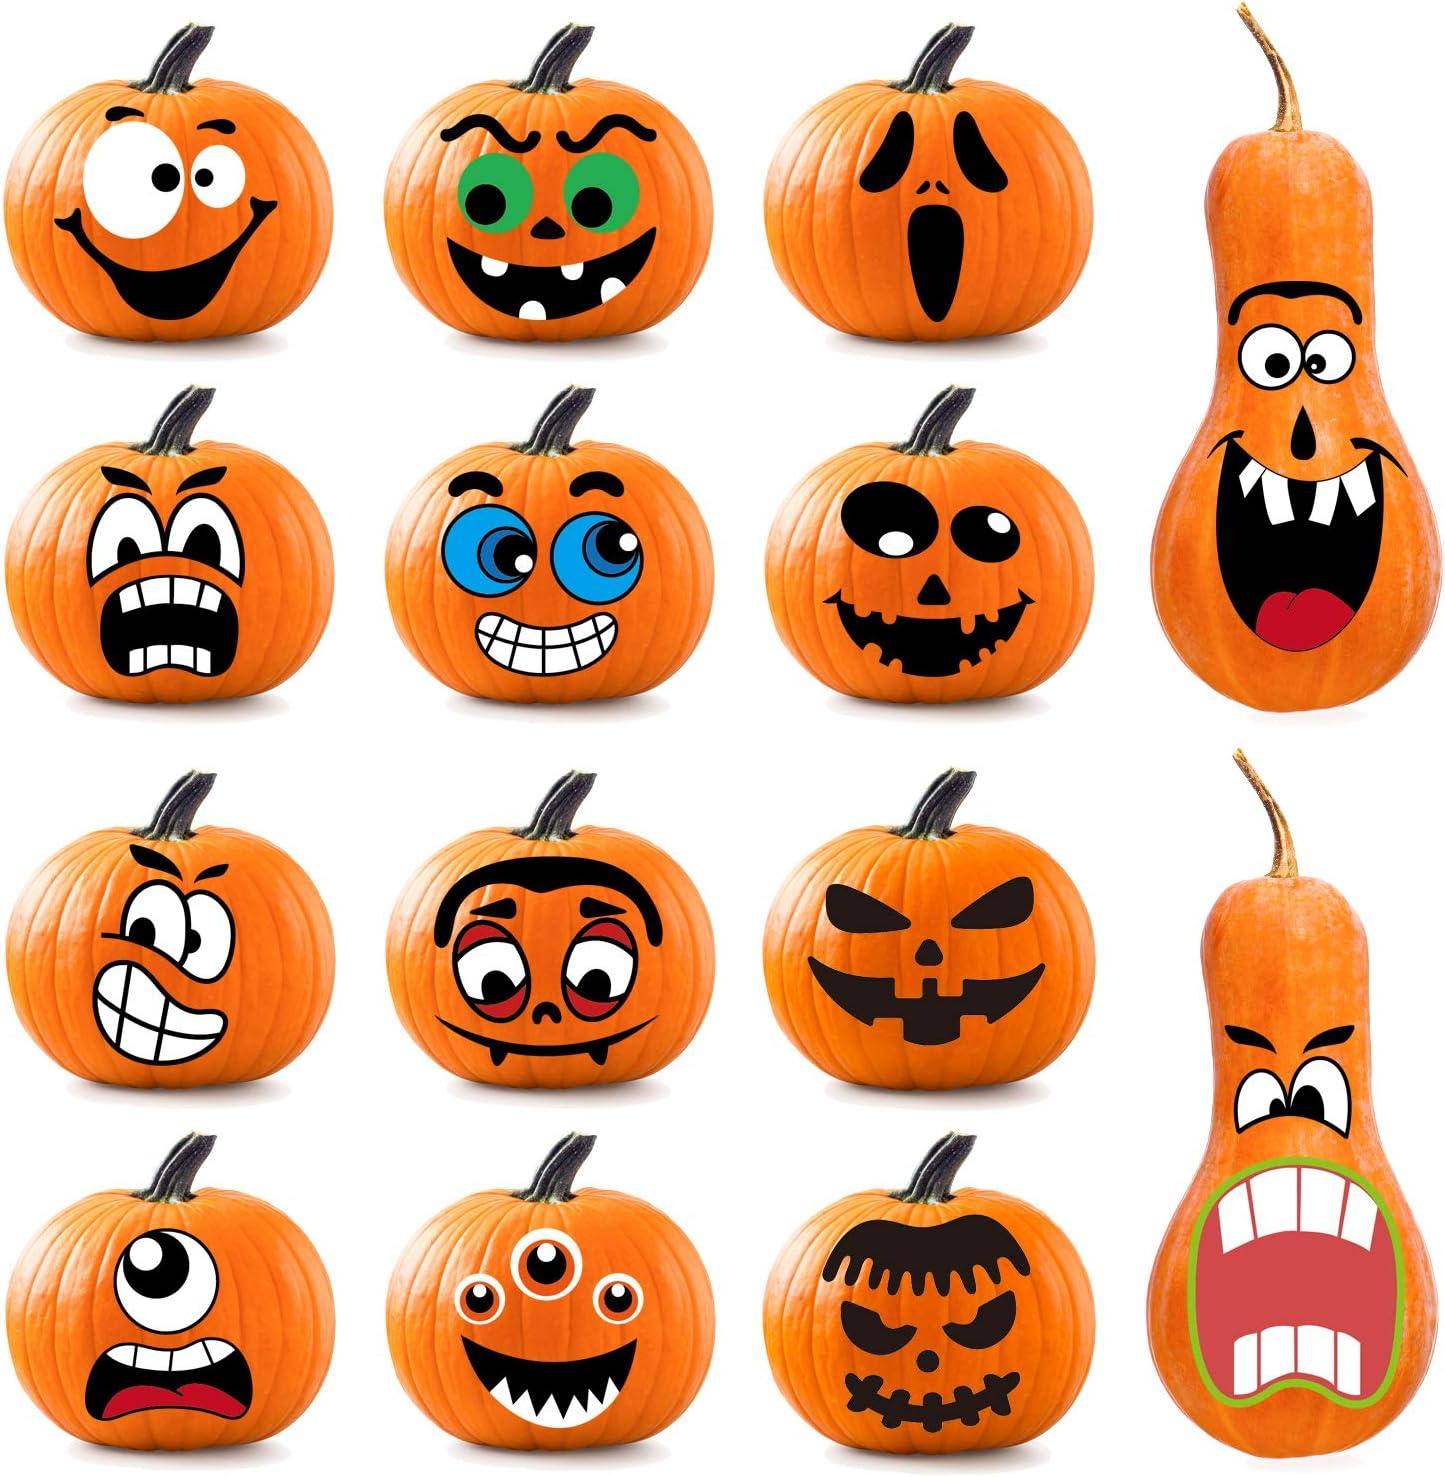 Happy pumpkin trick or treat 8\u8dglass Halloween ornament ...